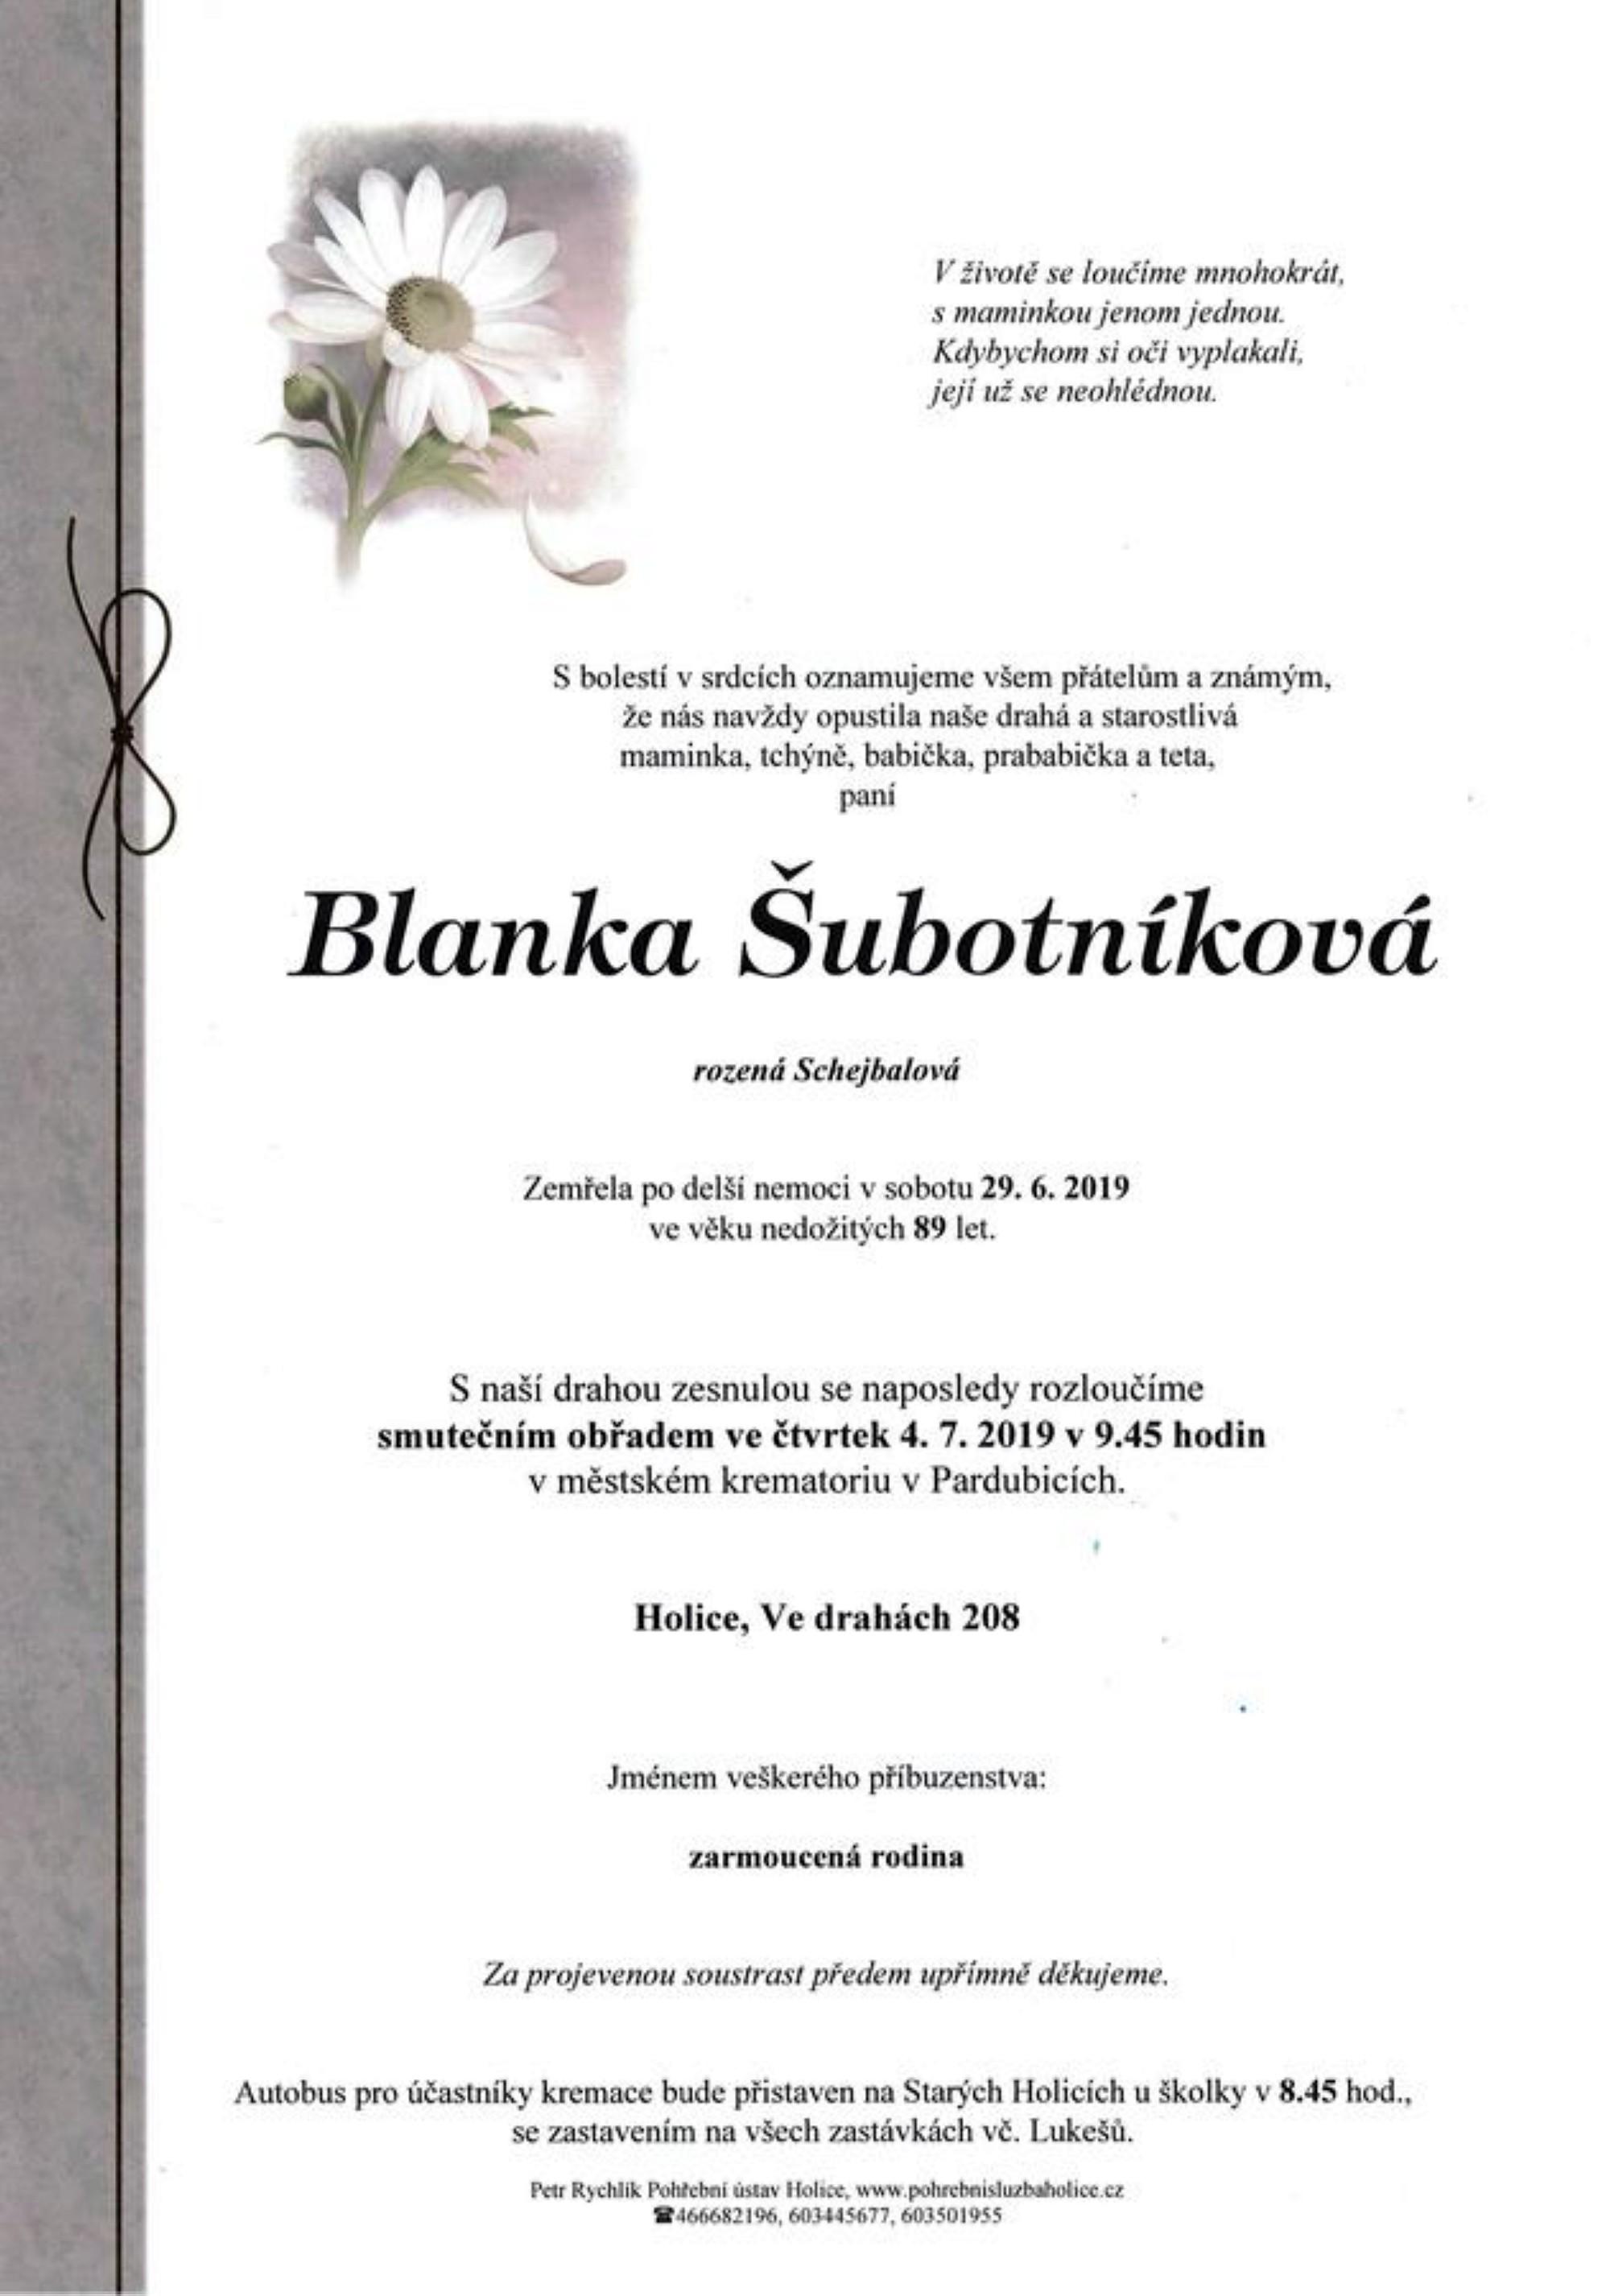 Blanka Šubotníková